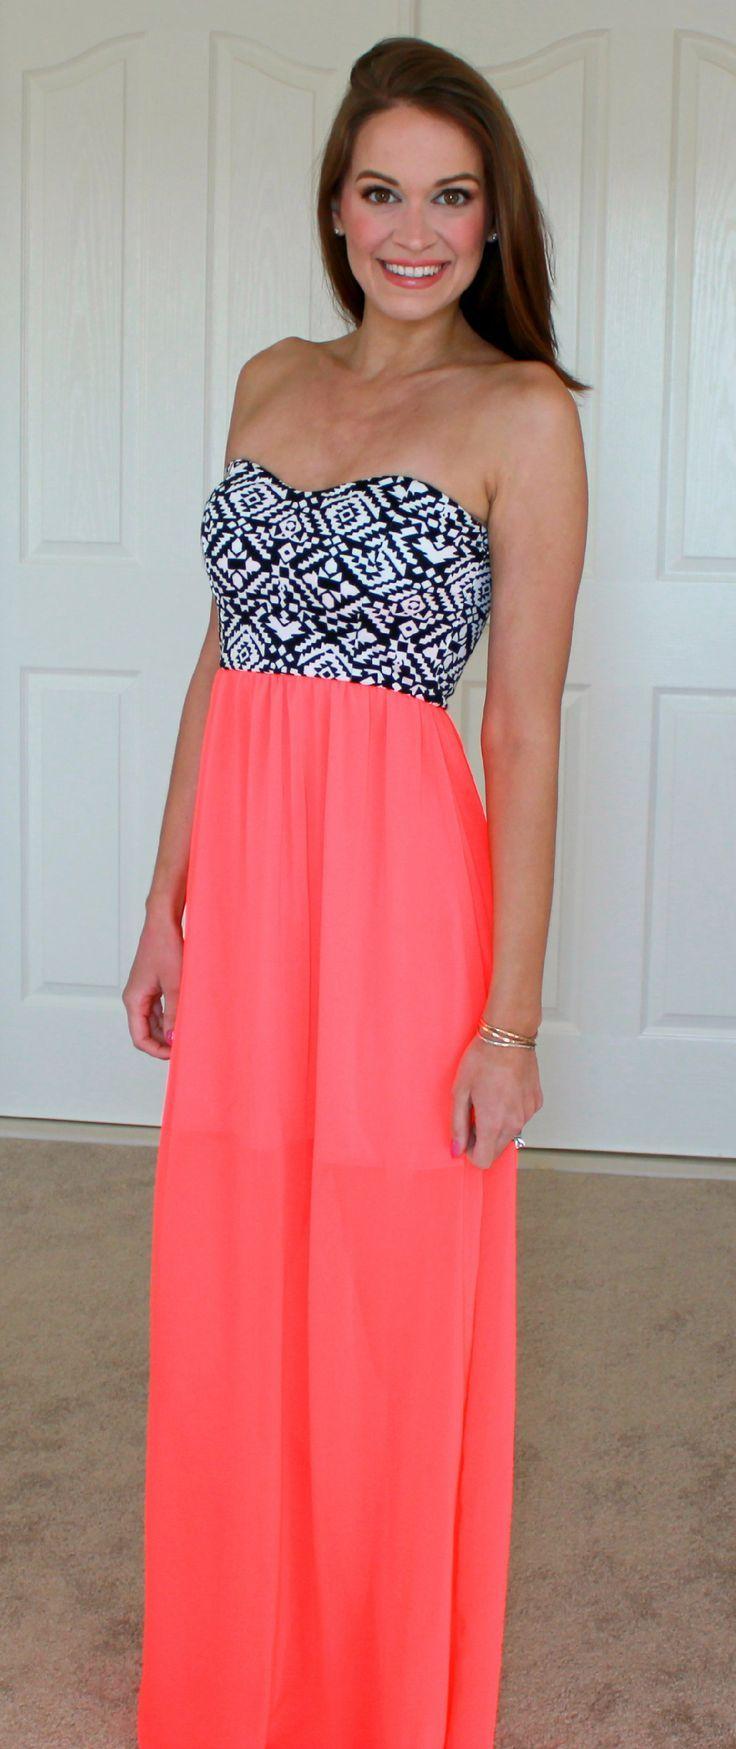 best dresses everyday images on pinterest